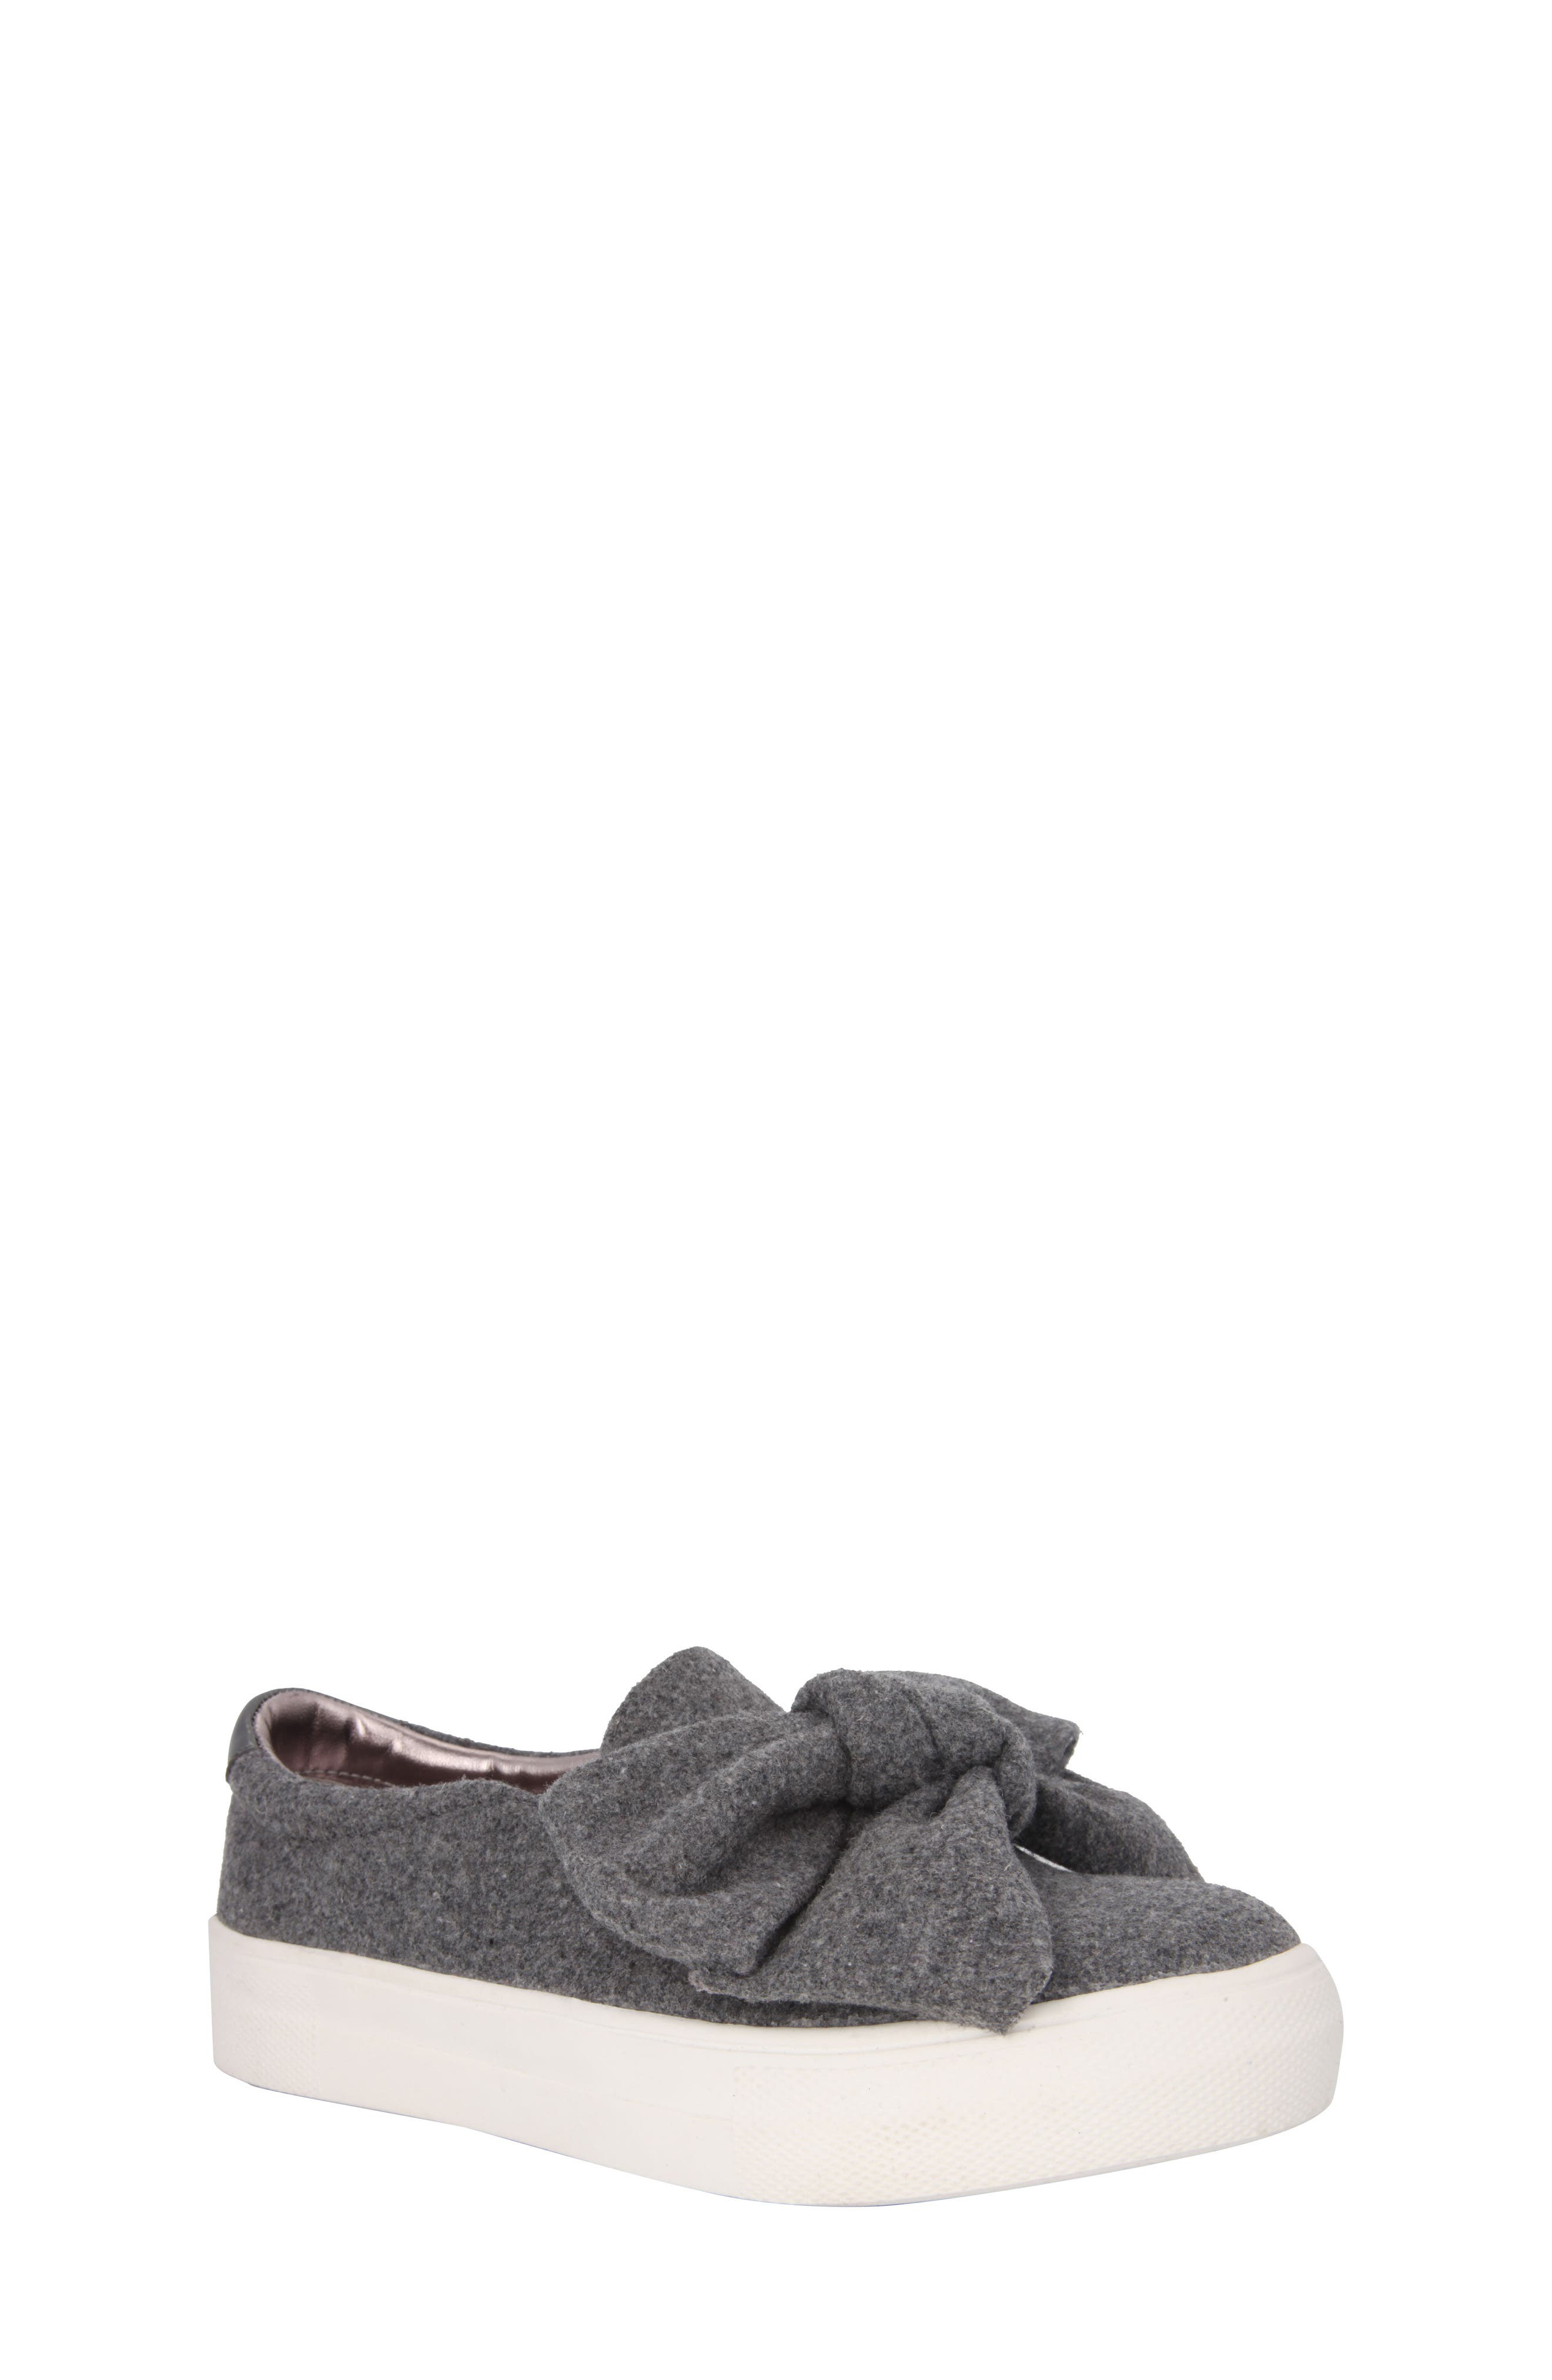 Vaneza Slip-On Bow Sneaker,                             Main thumbnail 1, color,                             Grey Flannel